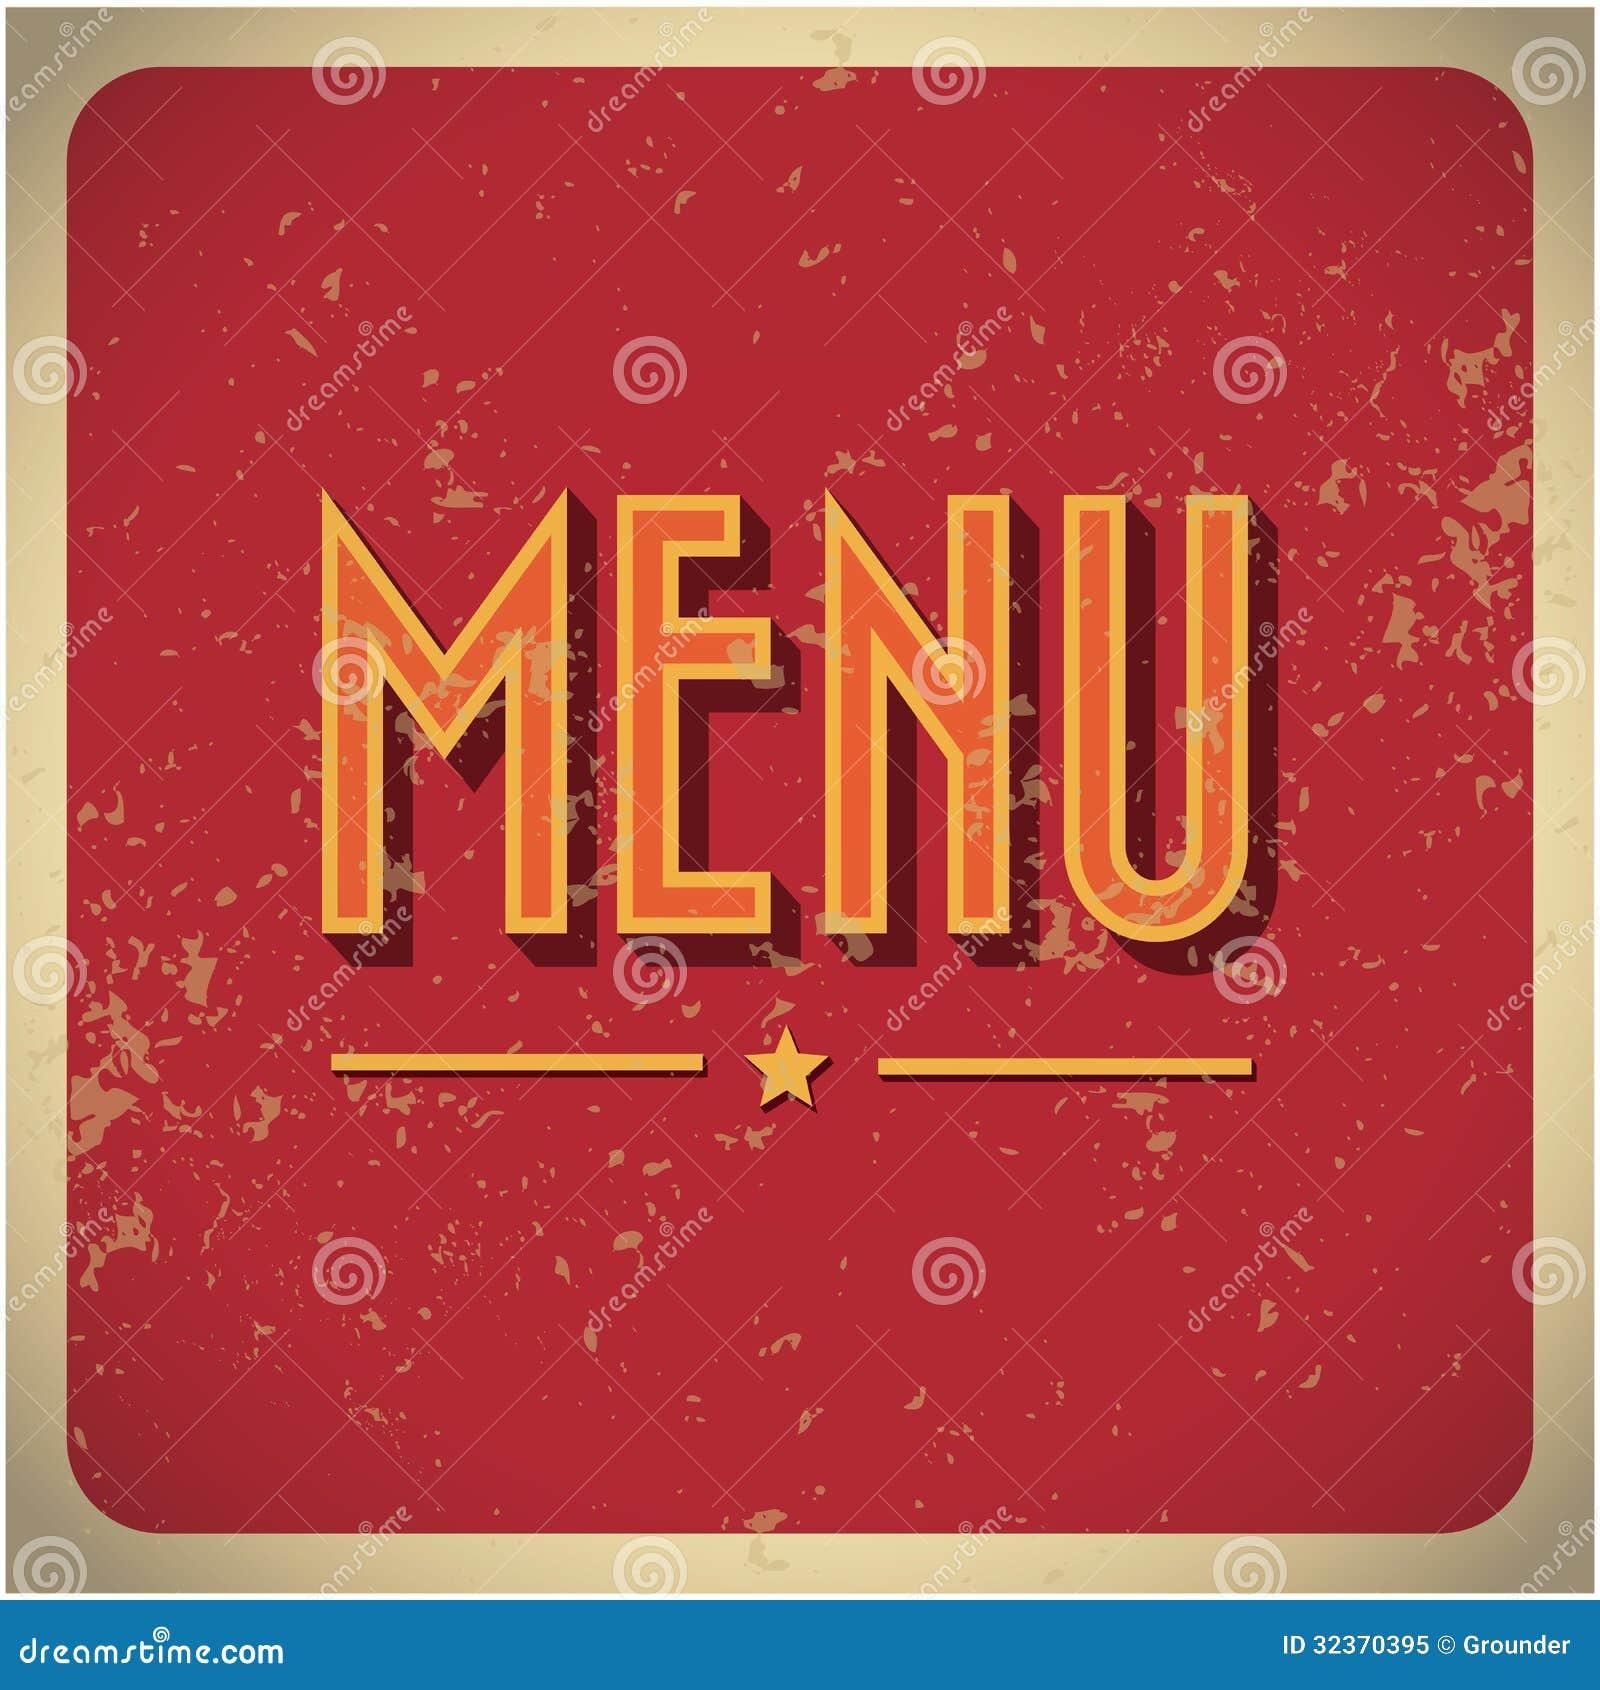 restaurant menu card design template. royalty free stock photo